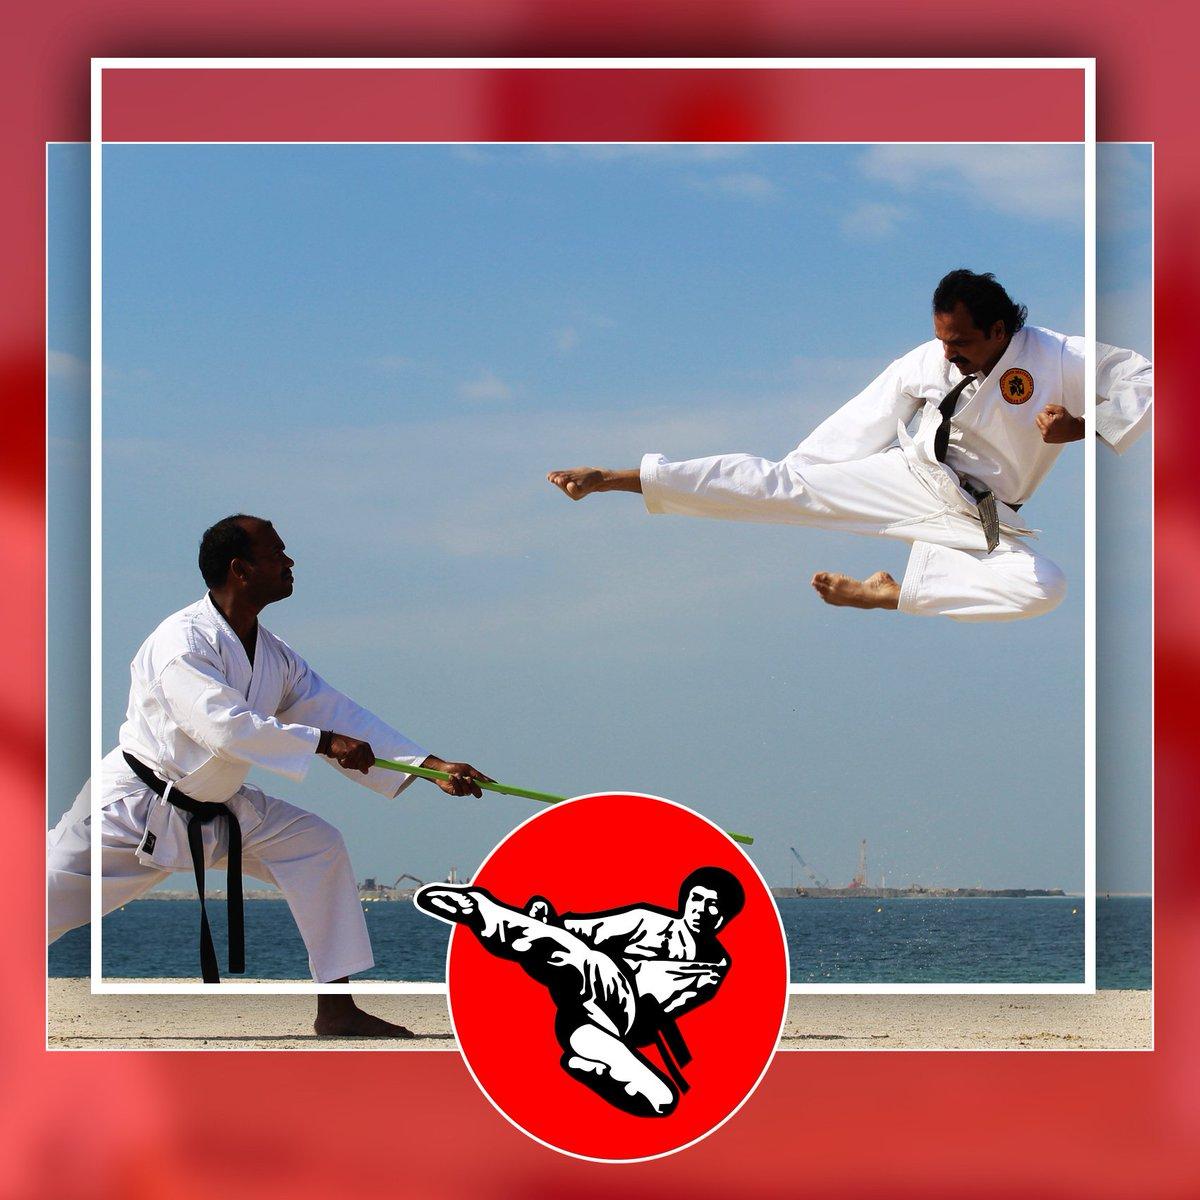 Golden Falcon Karate on Twitter: